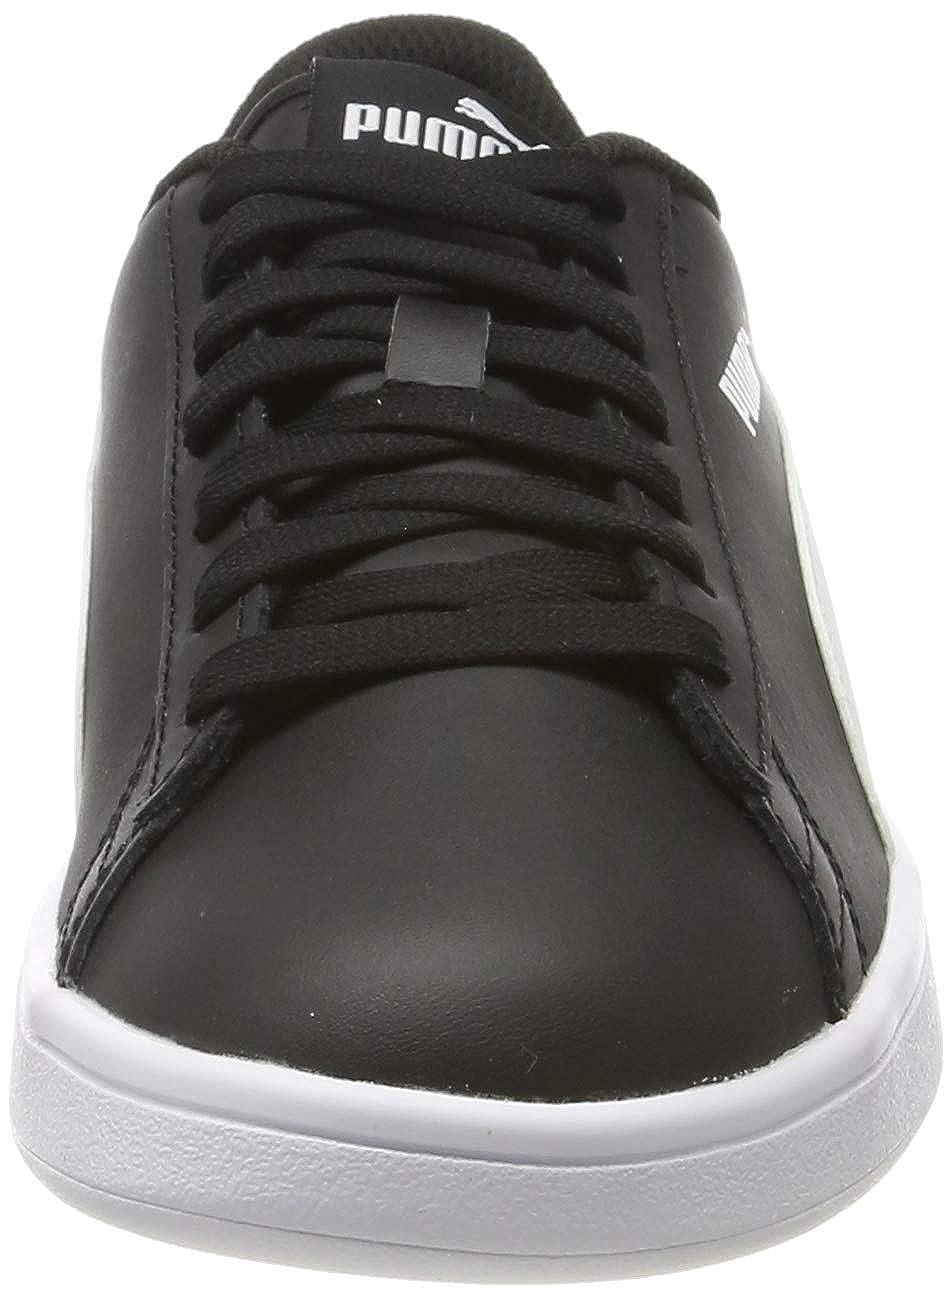 0b94c6e4196e Puma Smash V2 Leather, Baskets Basses Mixte Adulte: Puma: Amazon.fr:  Chaussures et Sacs